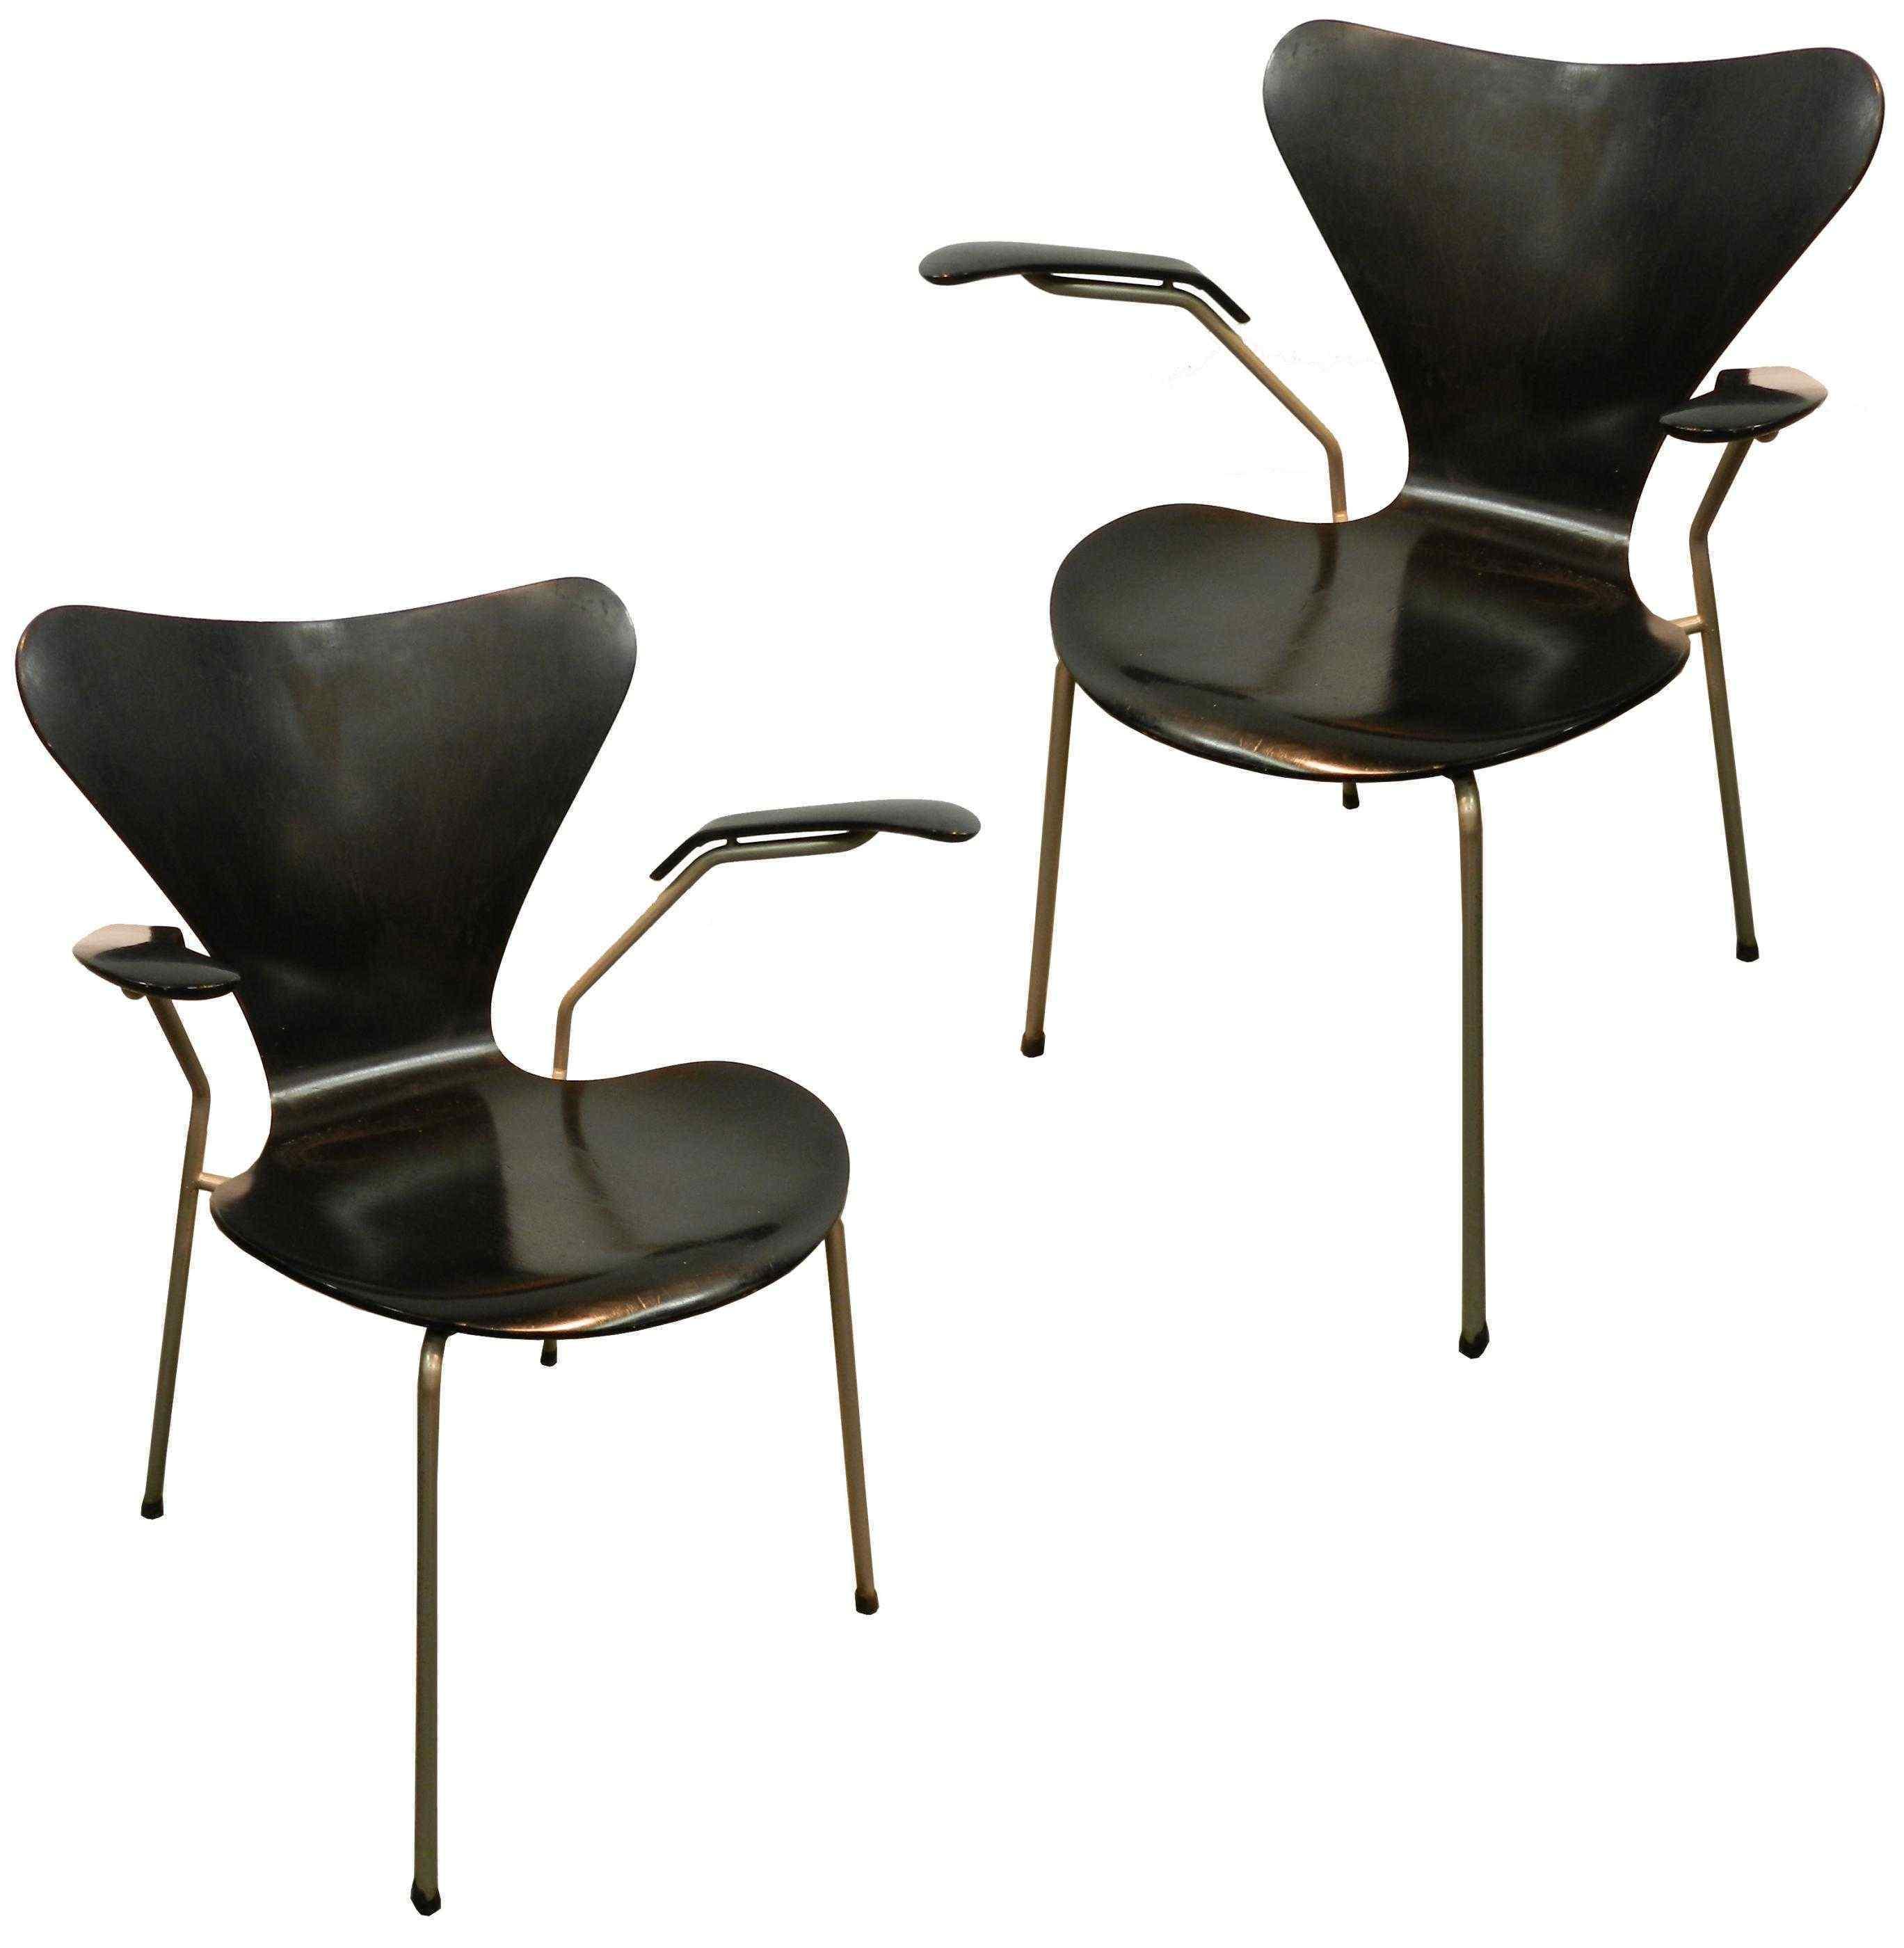 Arne Jacobsen, coppia di sedie, 1955